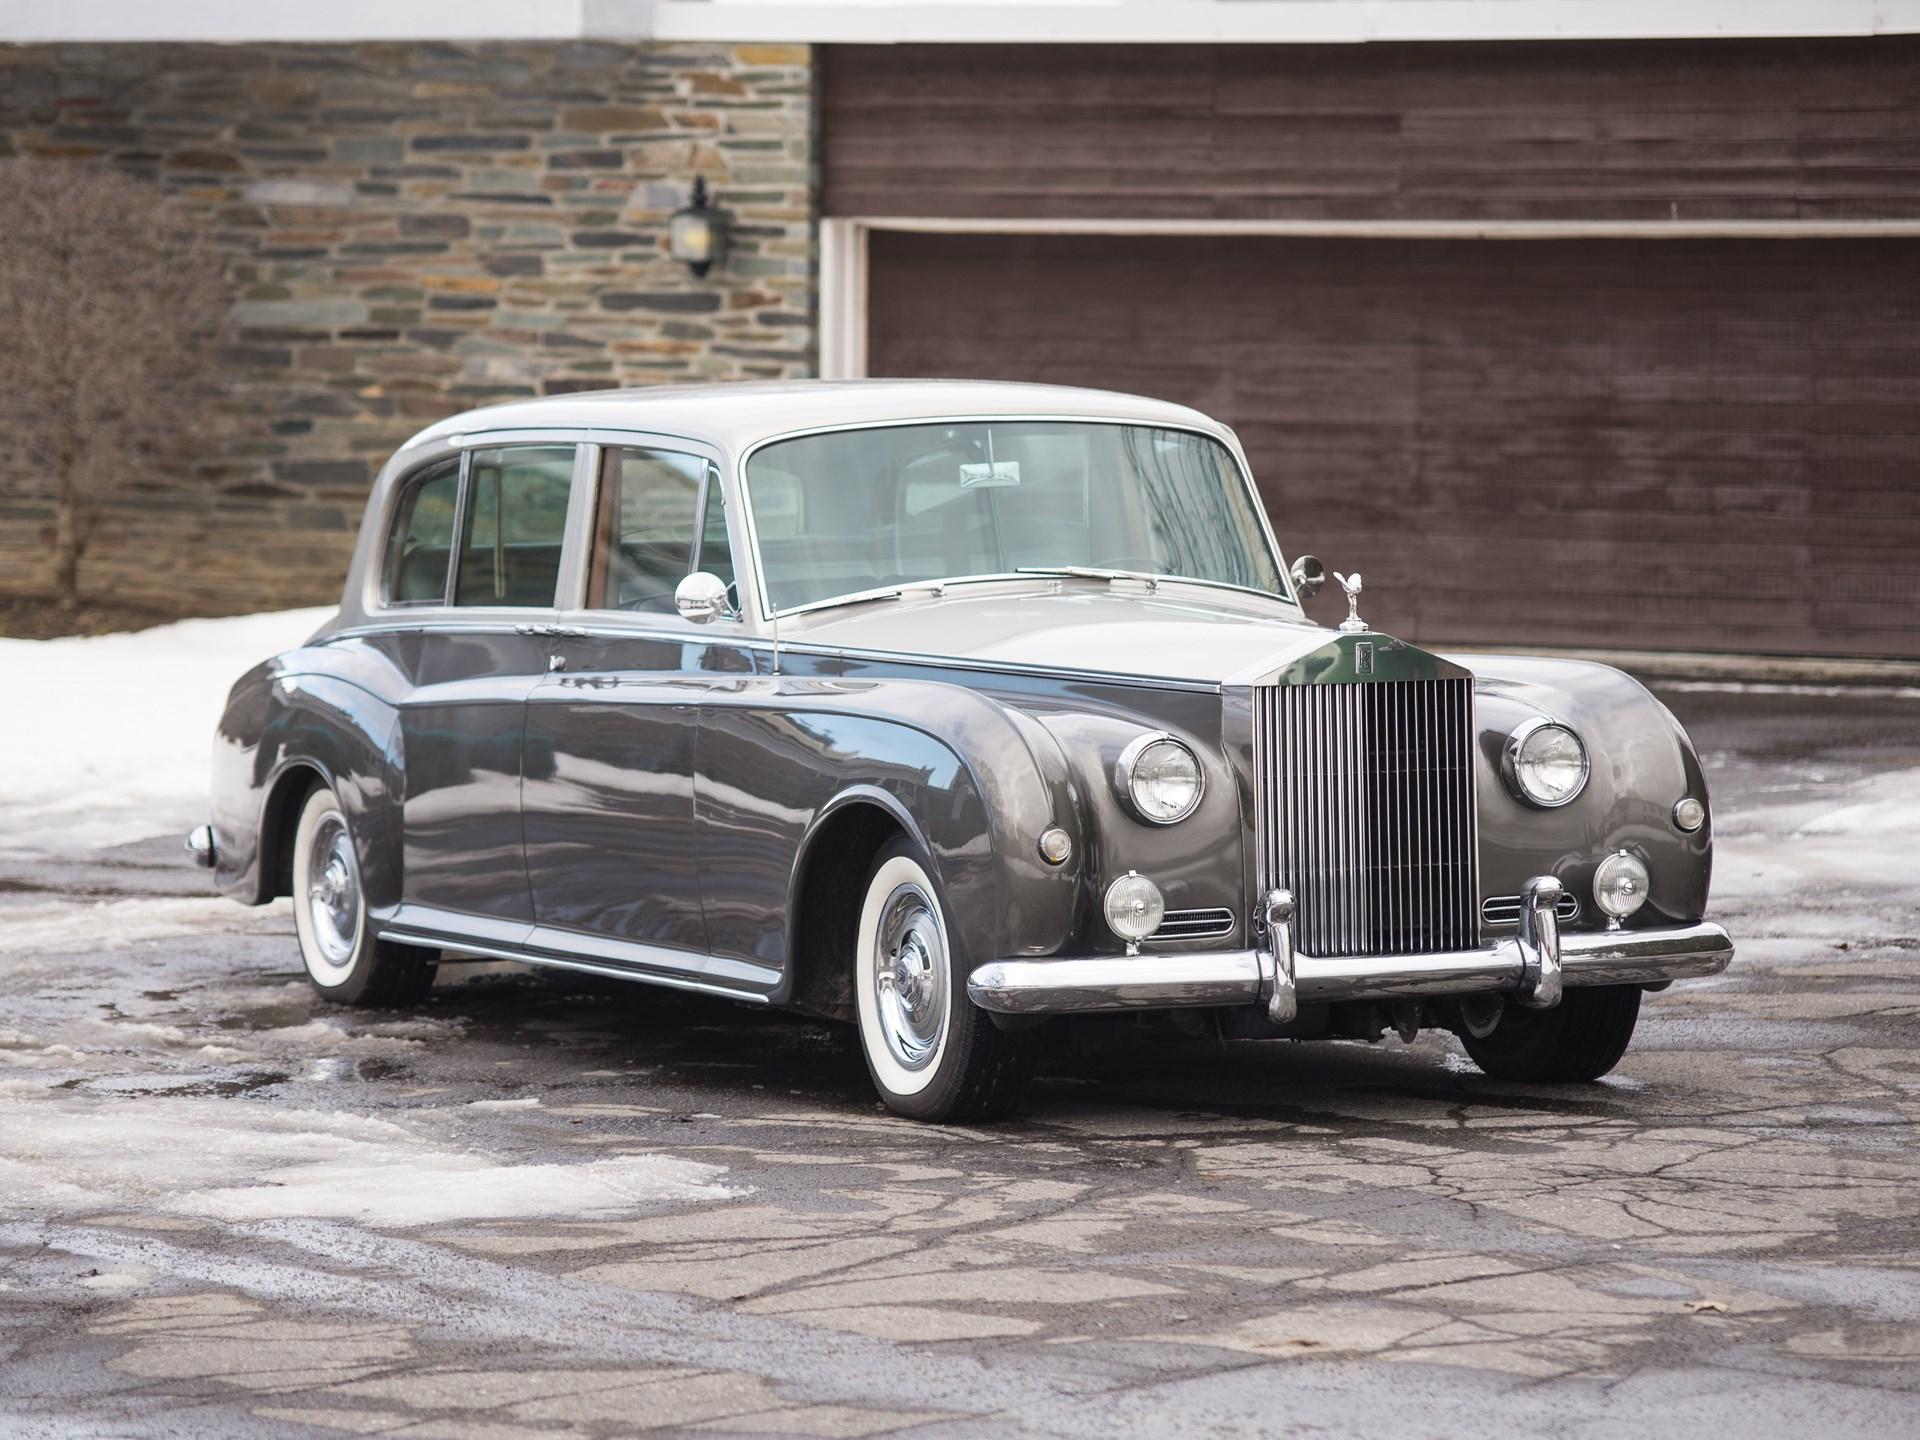 Rolls Royce Limo >> Rm Sotheby S 1962 Rolls Royce Phantom V Limousine By Park Ward